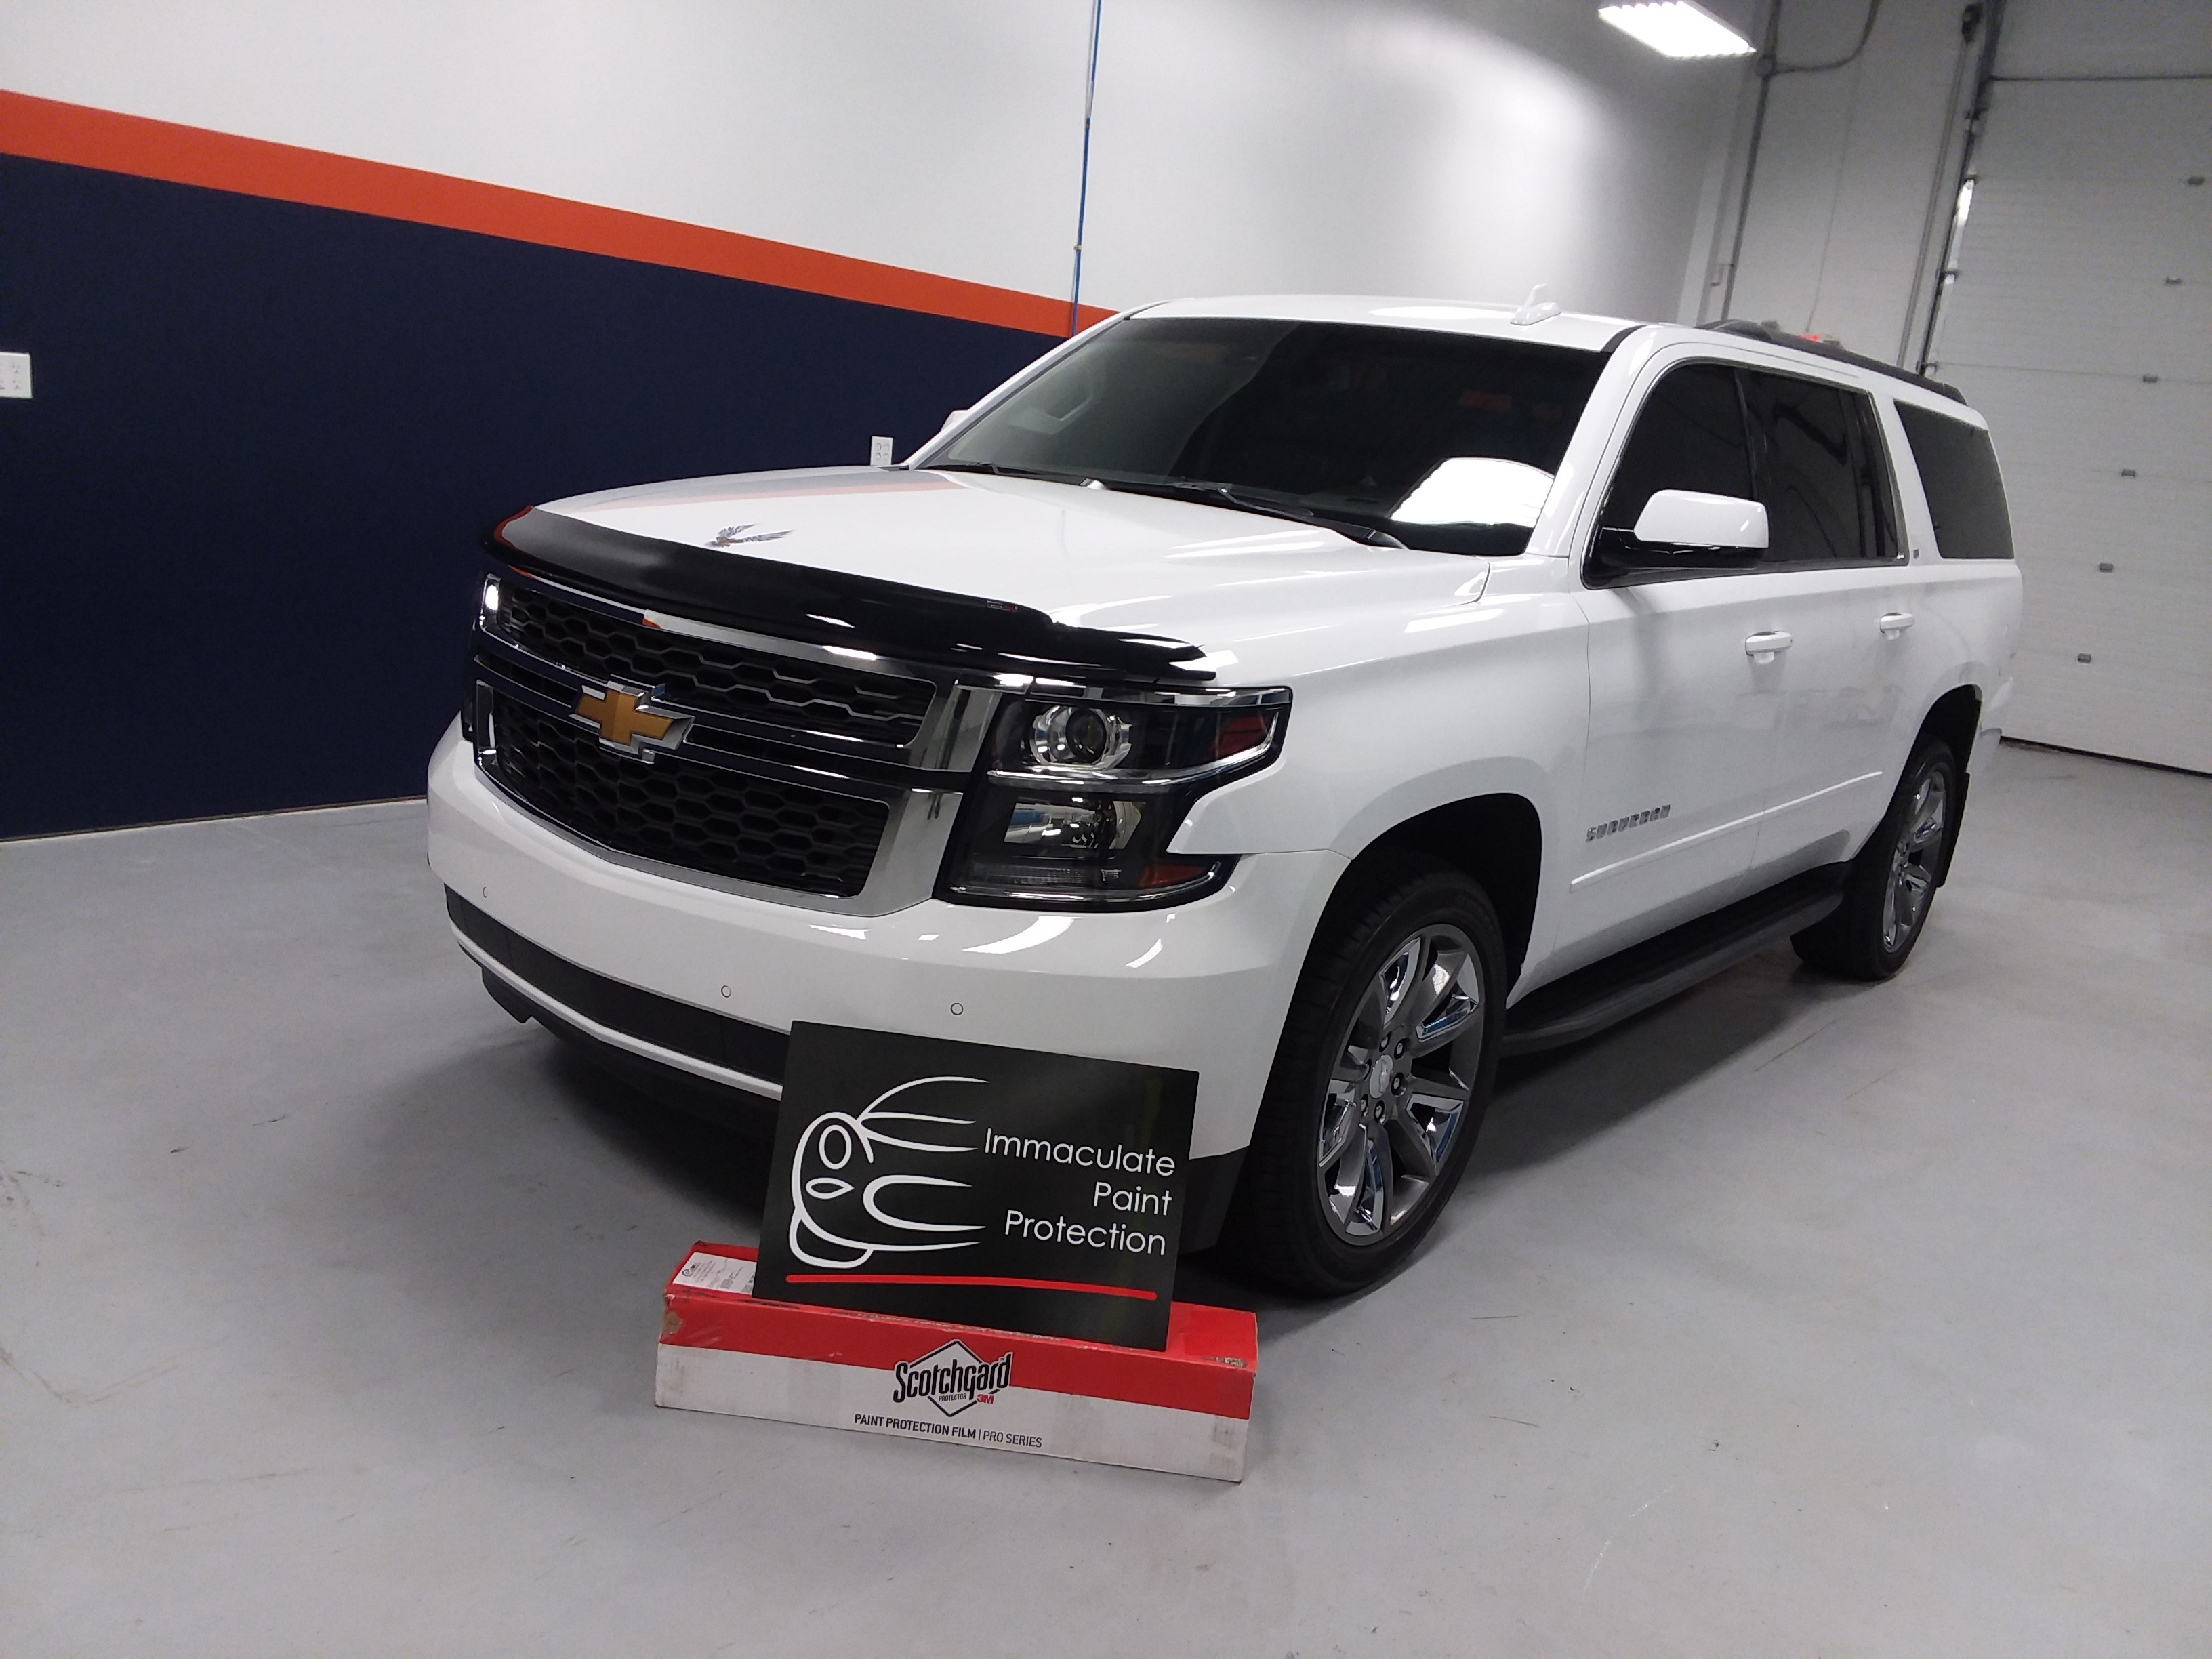 2018 Chevrolet Suburban PPF